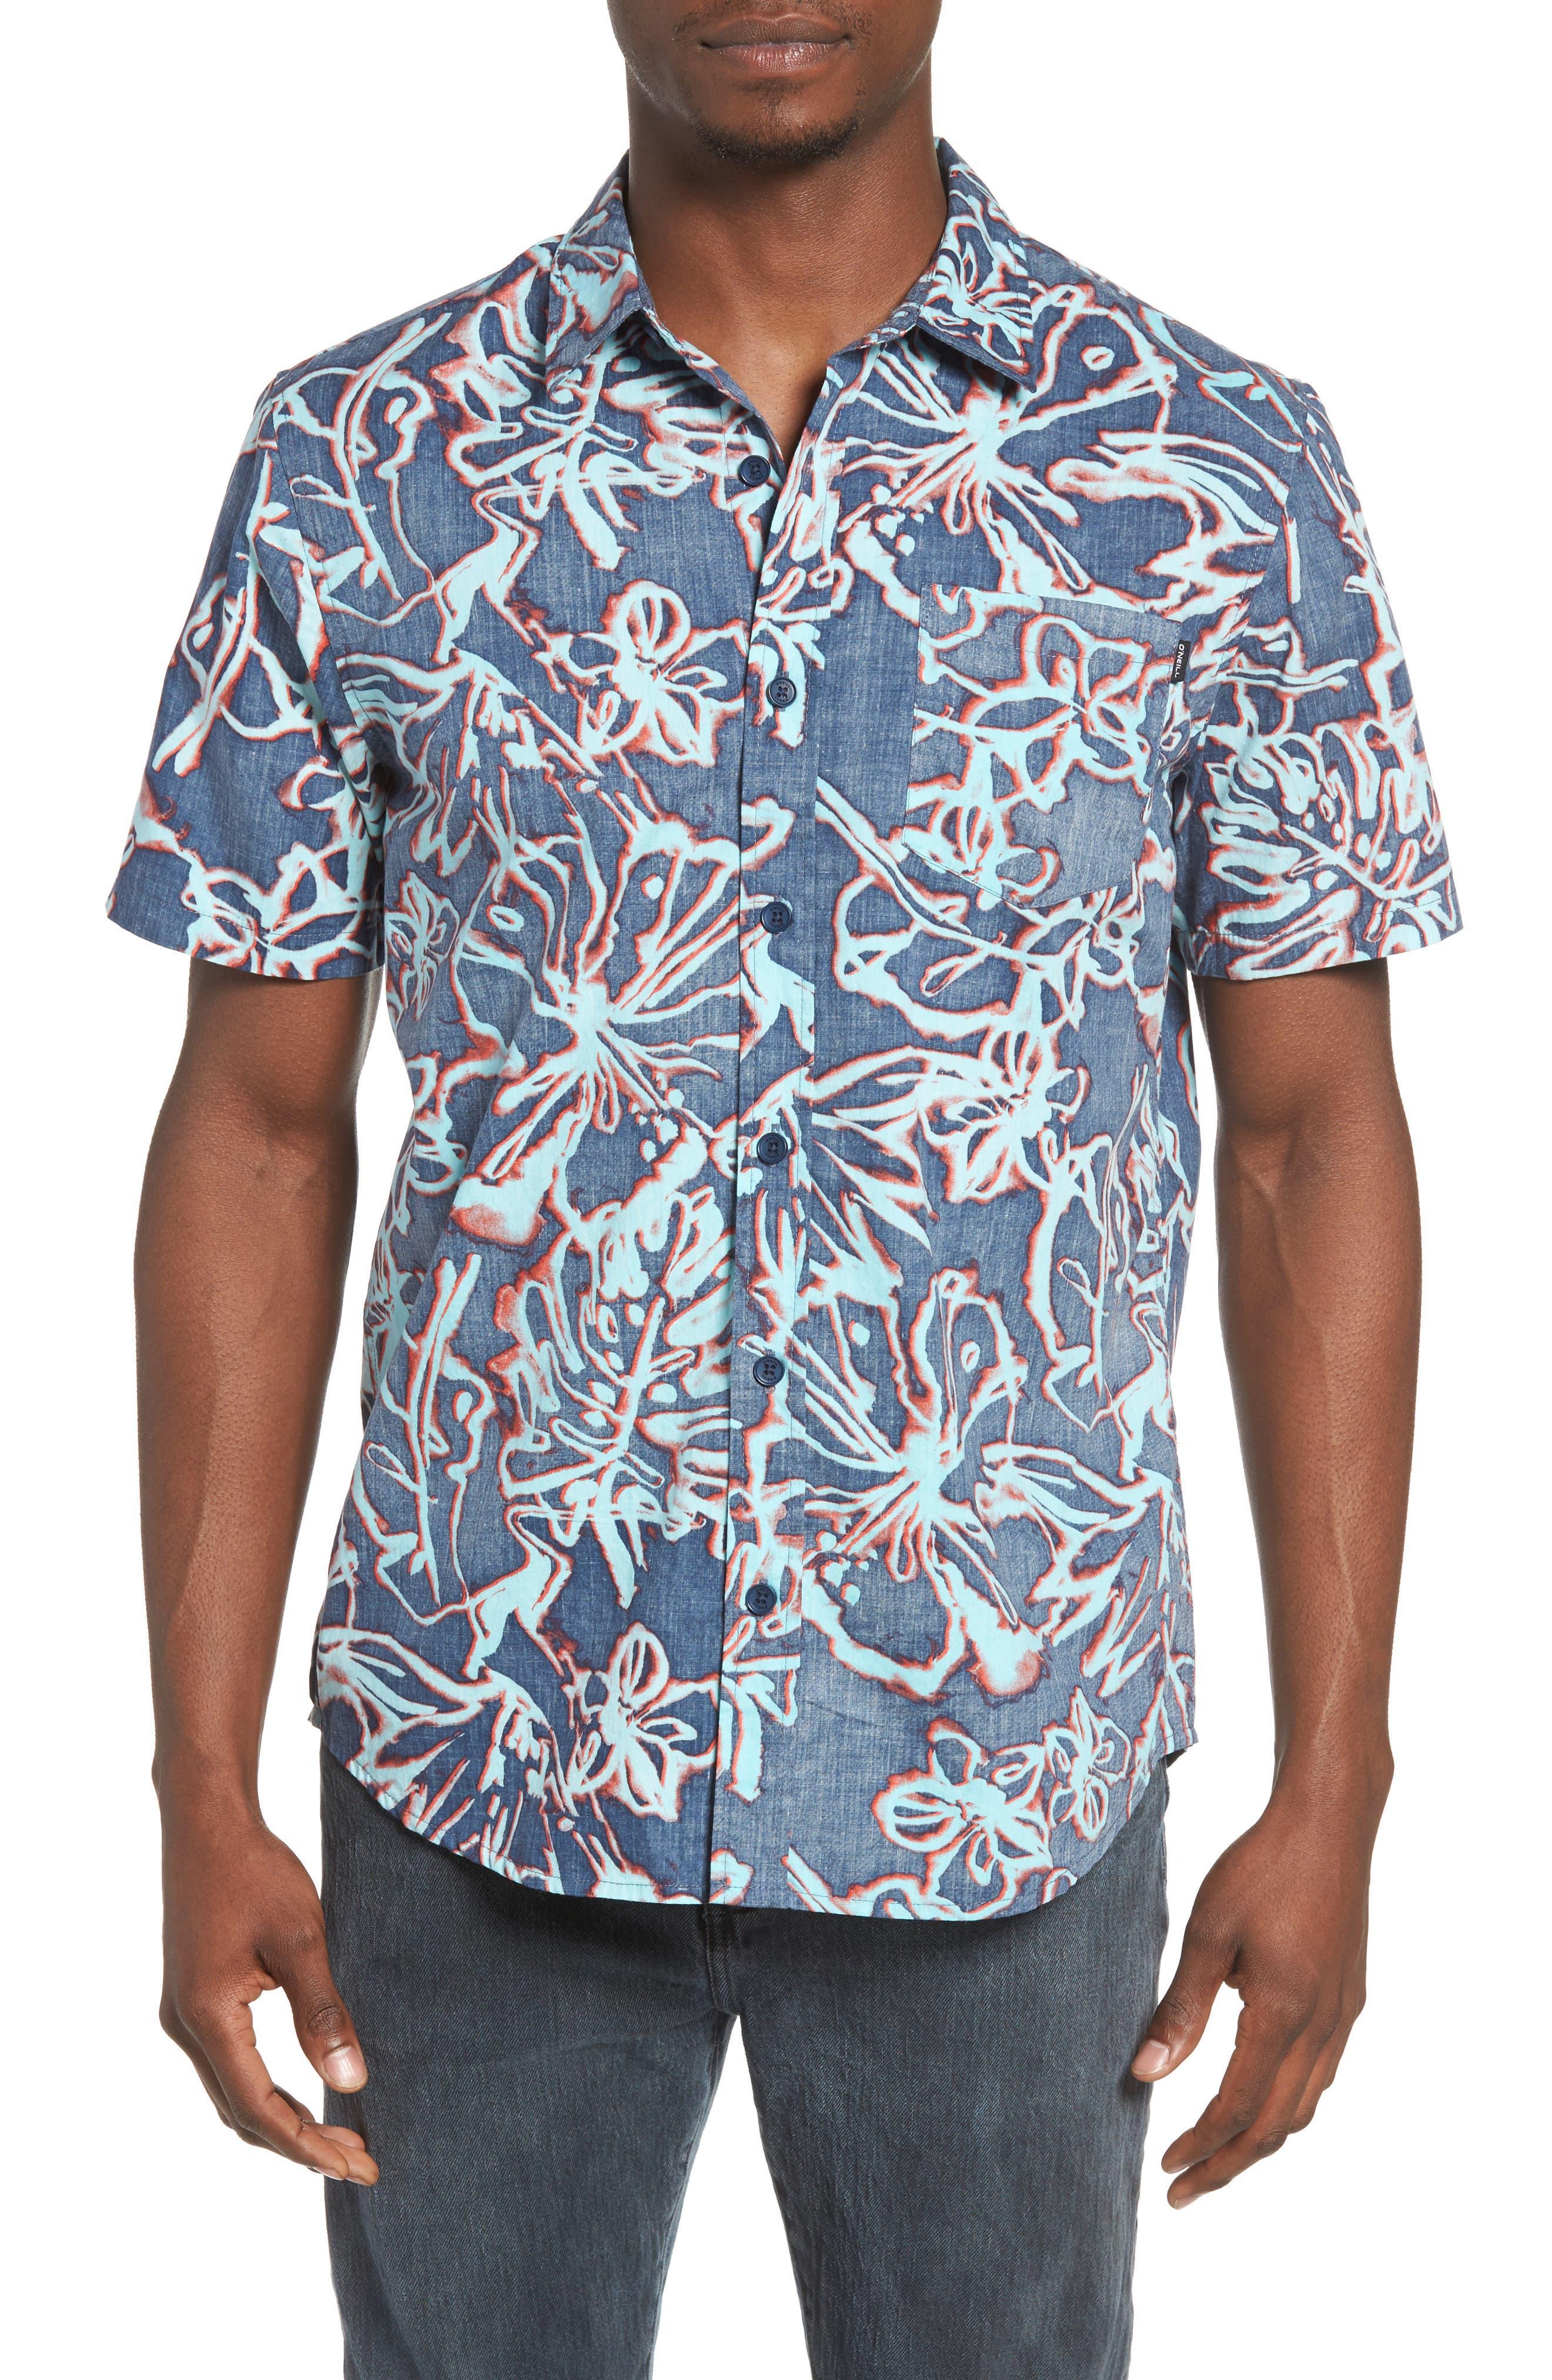 O'Neill Lanai Woven Shirt